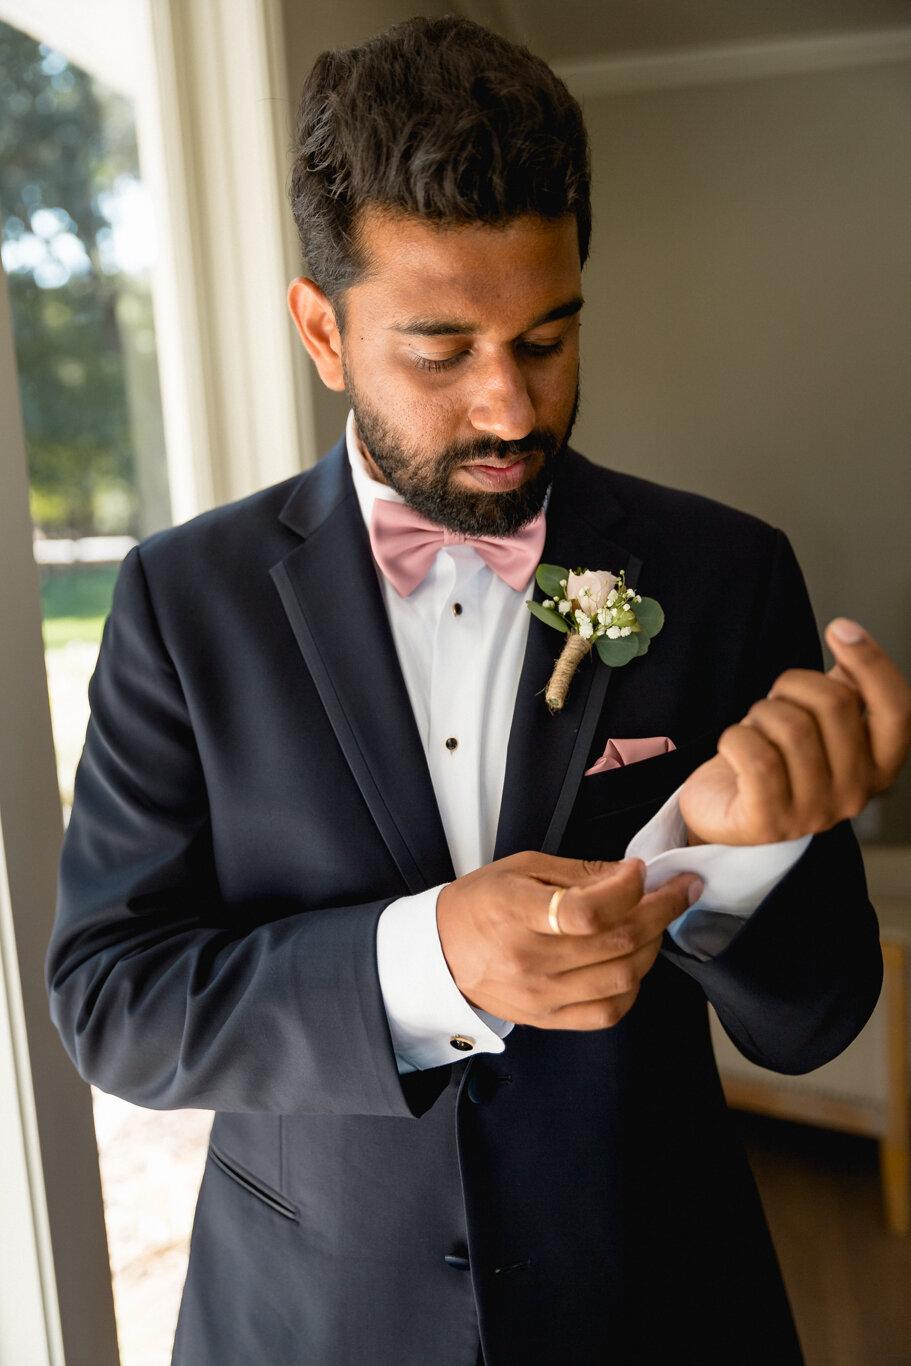 2019.08.24_Emily-Ashir-Wedding-at-the-Maples-5189.jpg